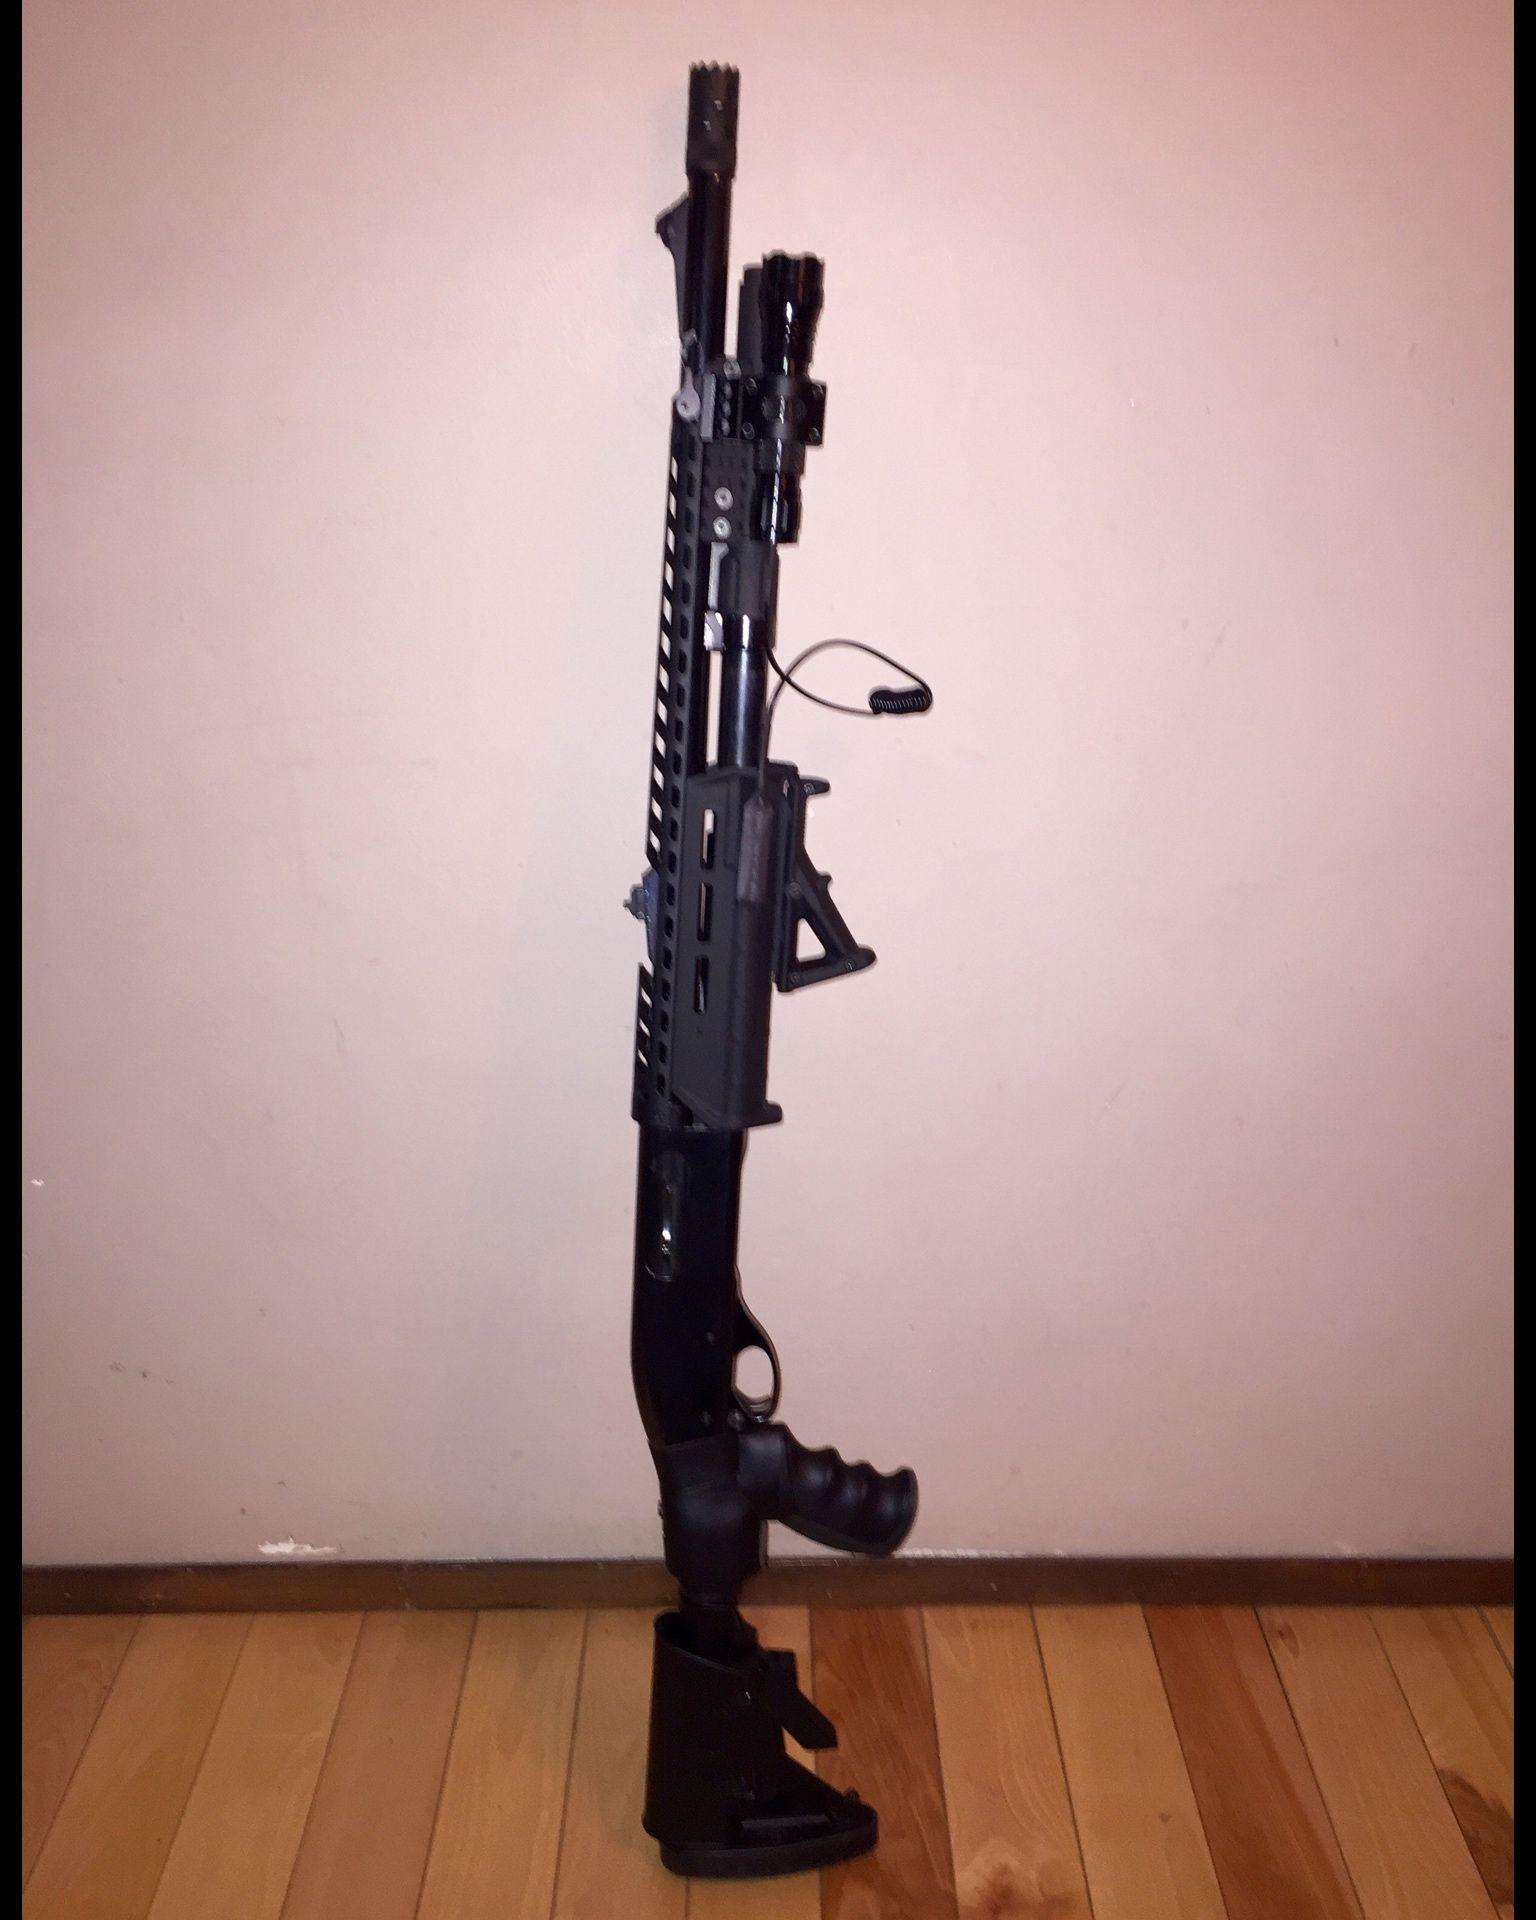 870 Tactical Build Remington 870 Wingmaster with 18  rifled Remington barrel breacher choke +2 magtube extension ATI heat shield Magpul M-LOK Forend ... & 870 Tactical Build Remington 870 Wingmaster with 18